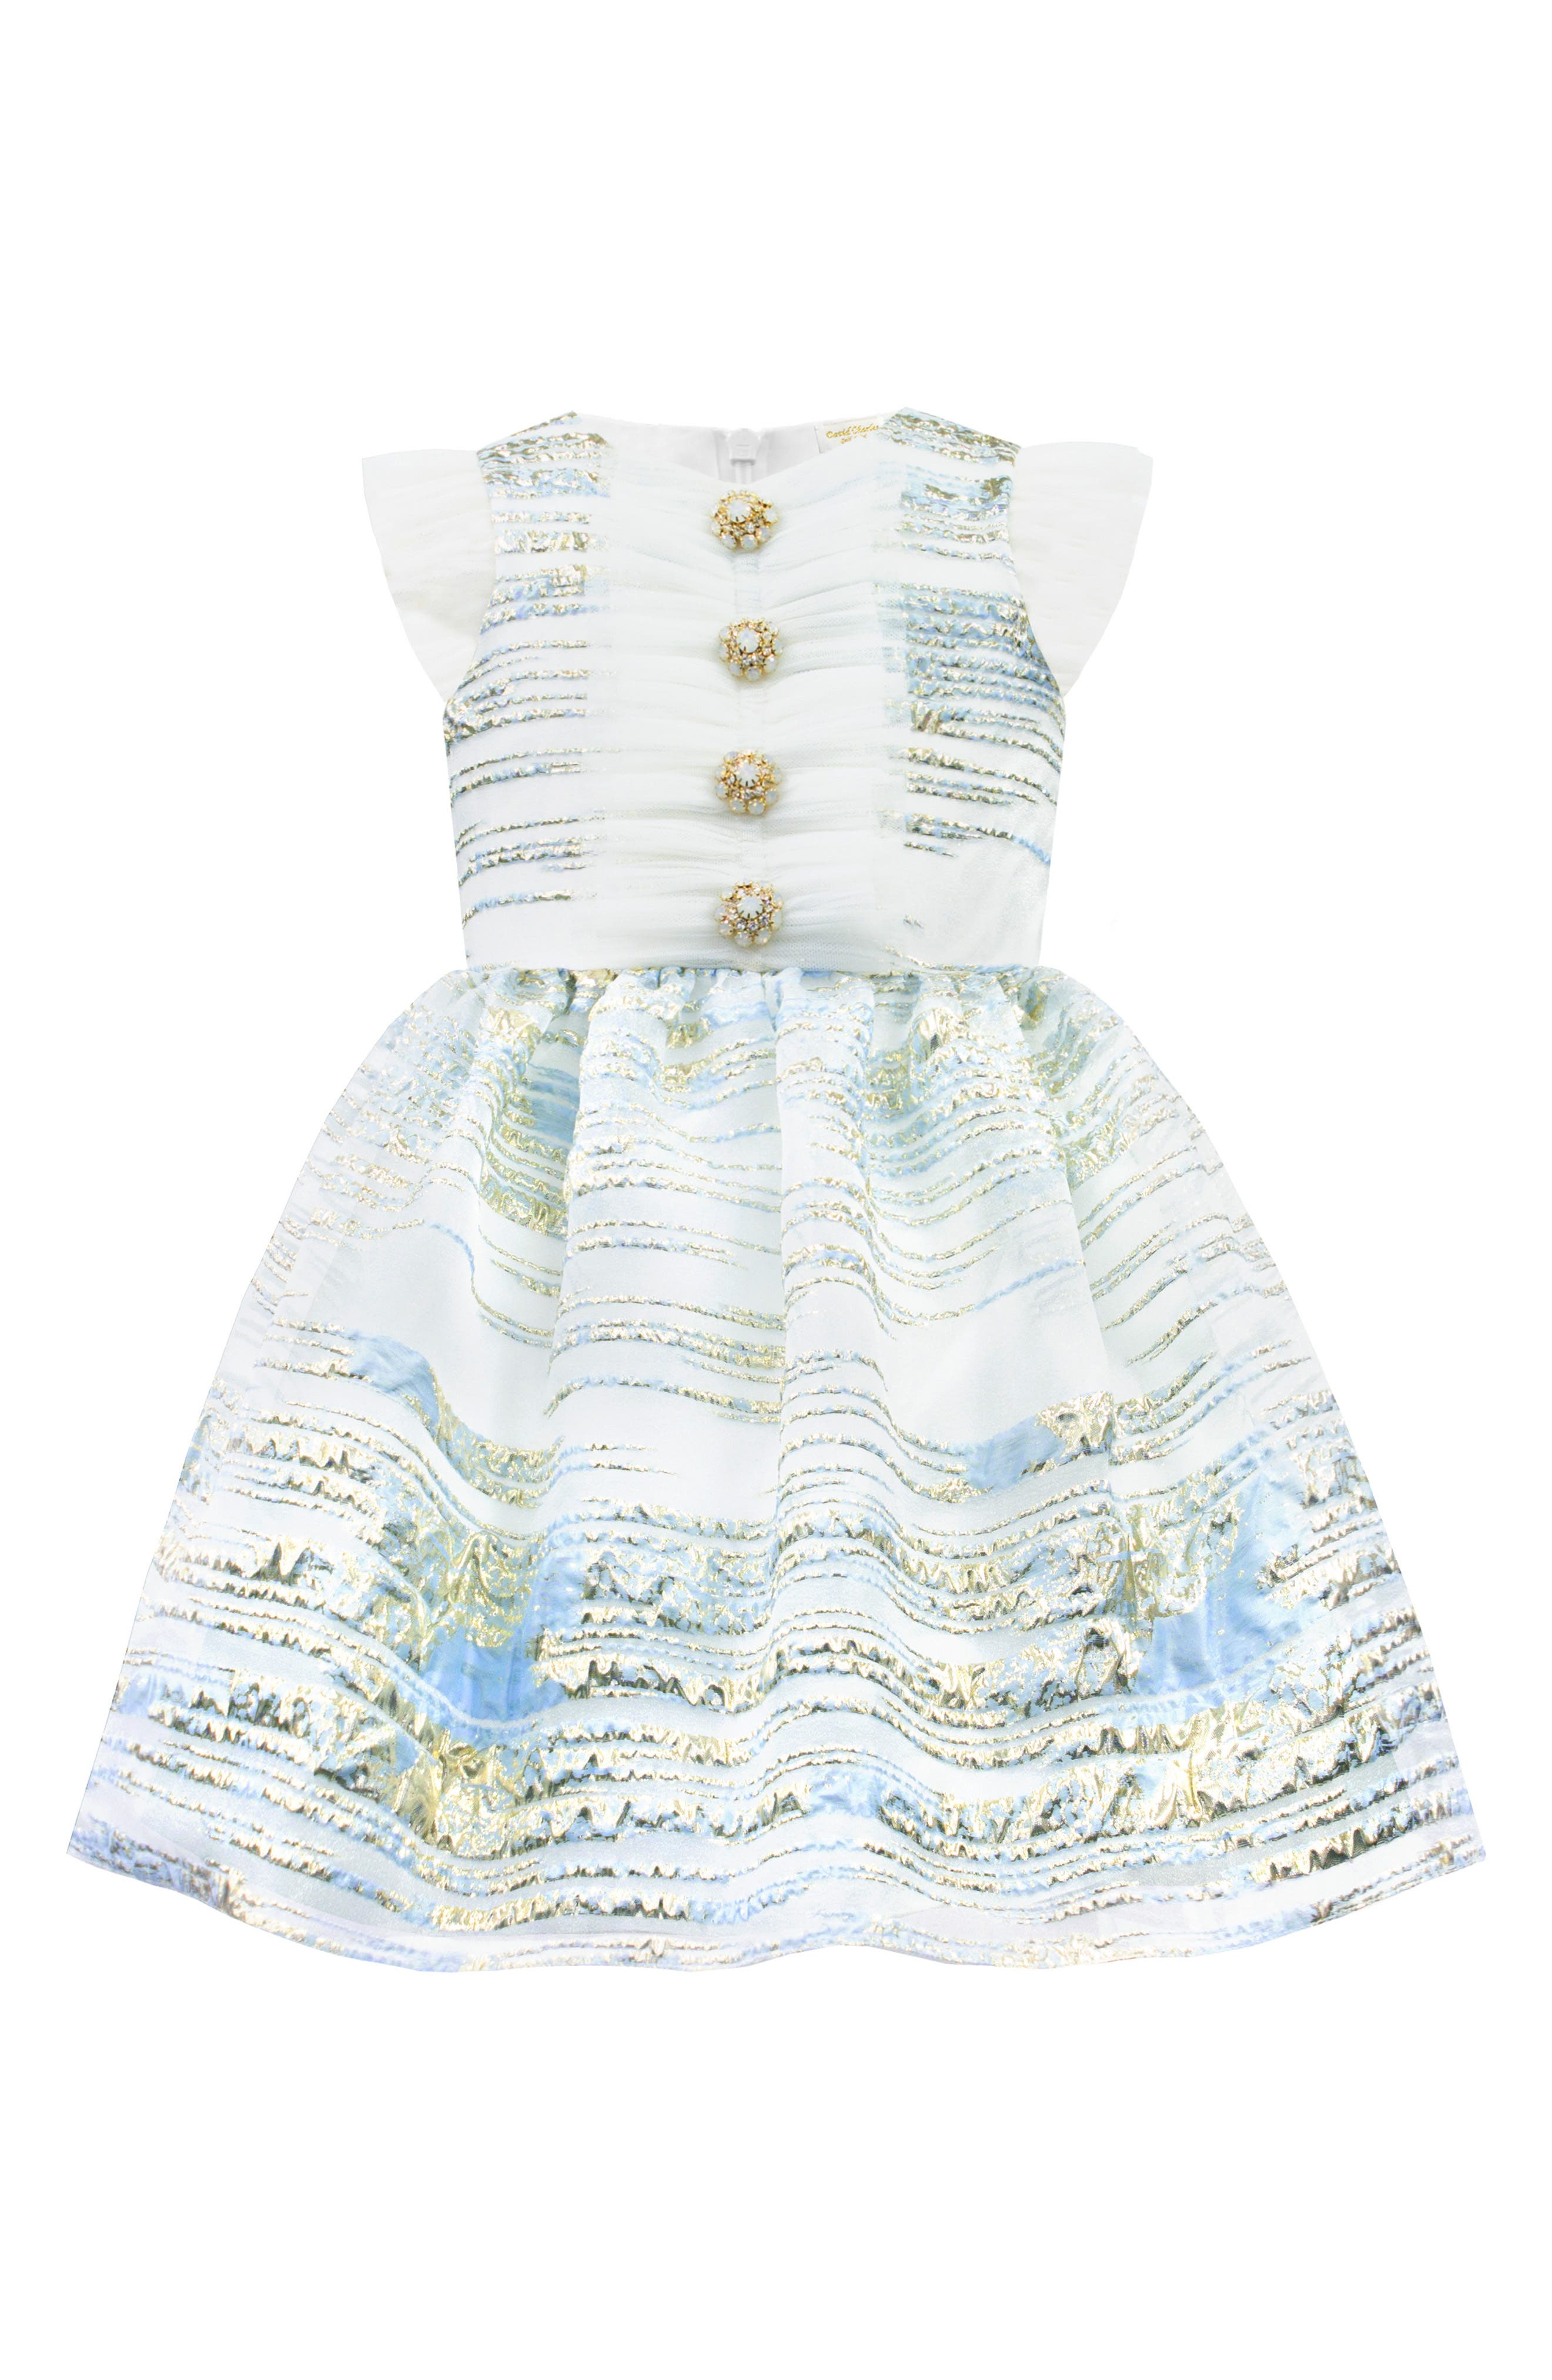 DAVID CHARLES, Metallic Stripe Organza Party Dress, Main thumbnail 1, color, BLUE